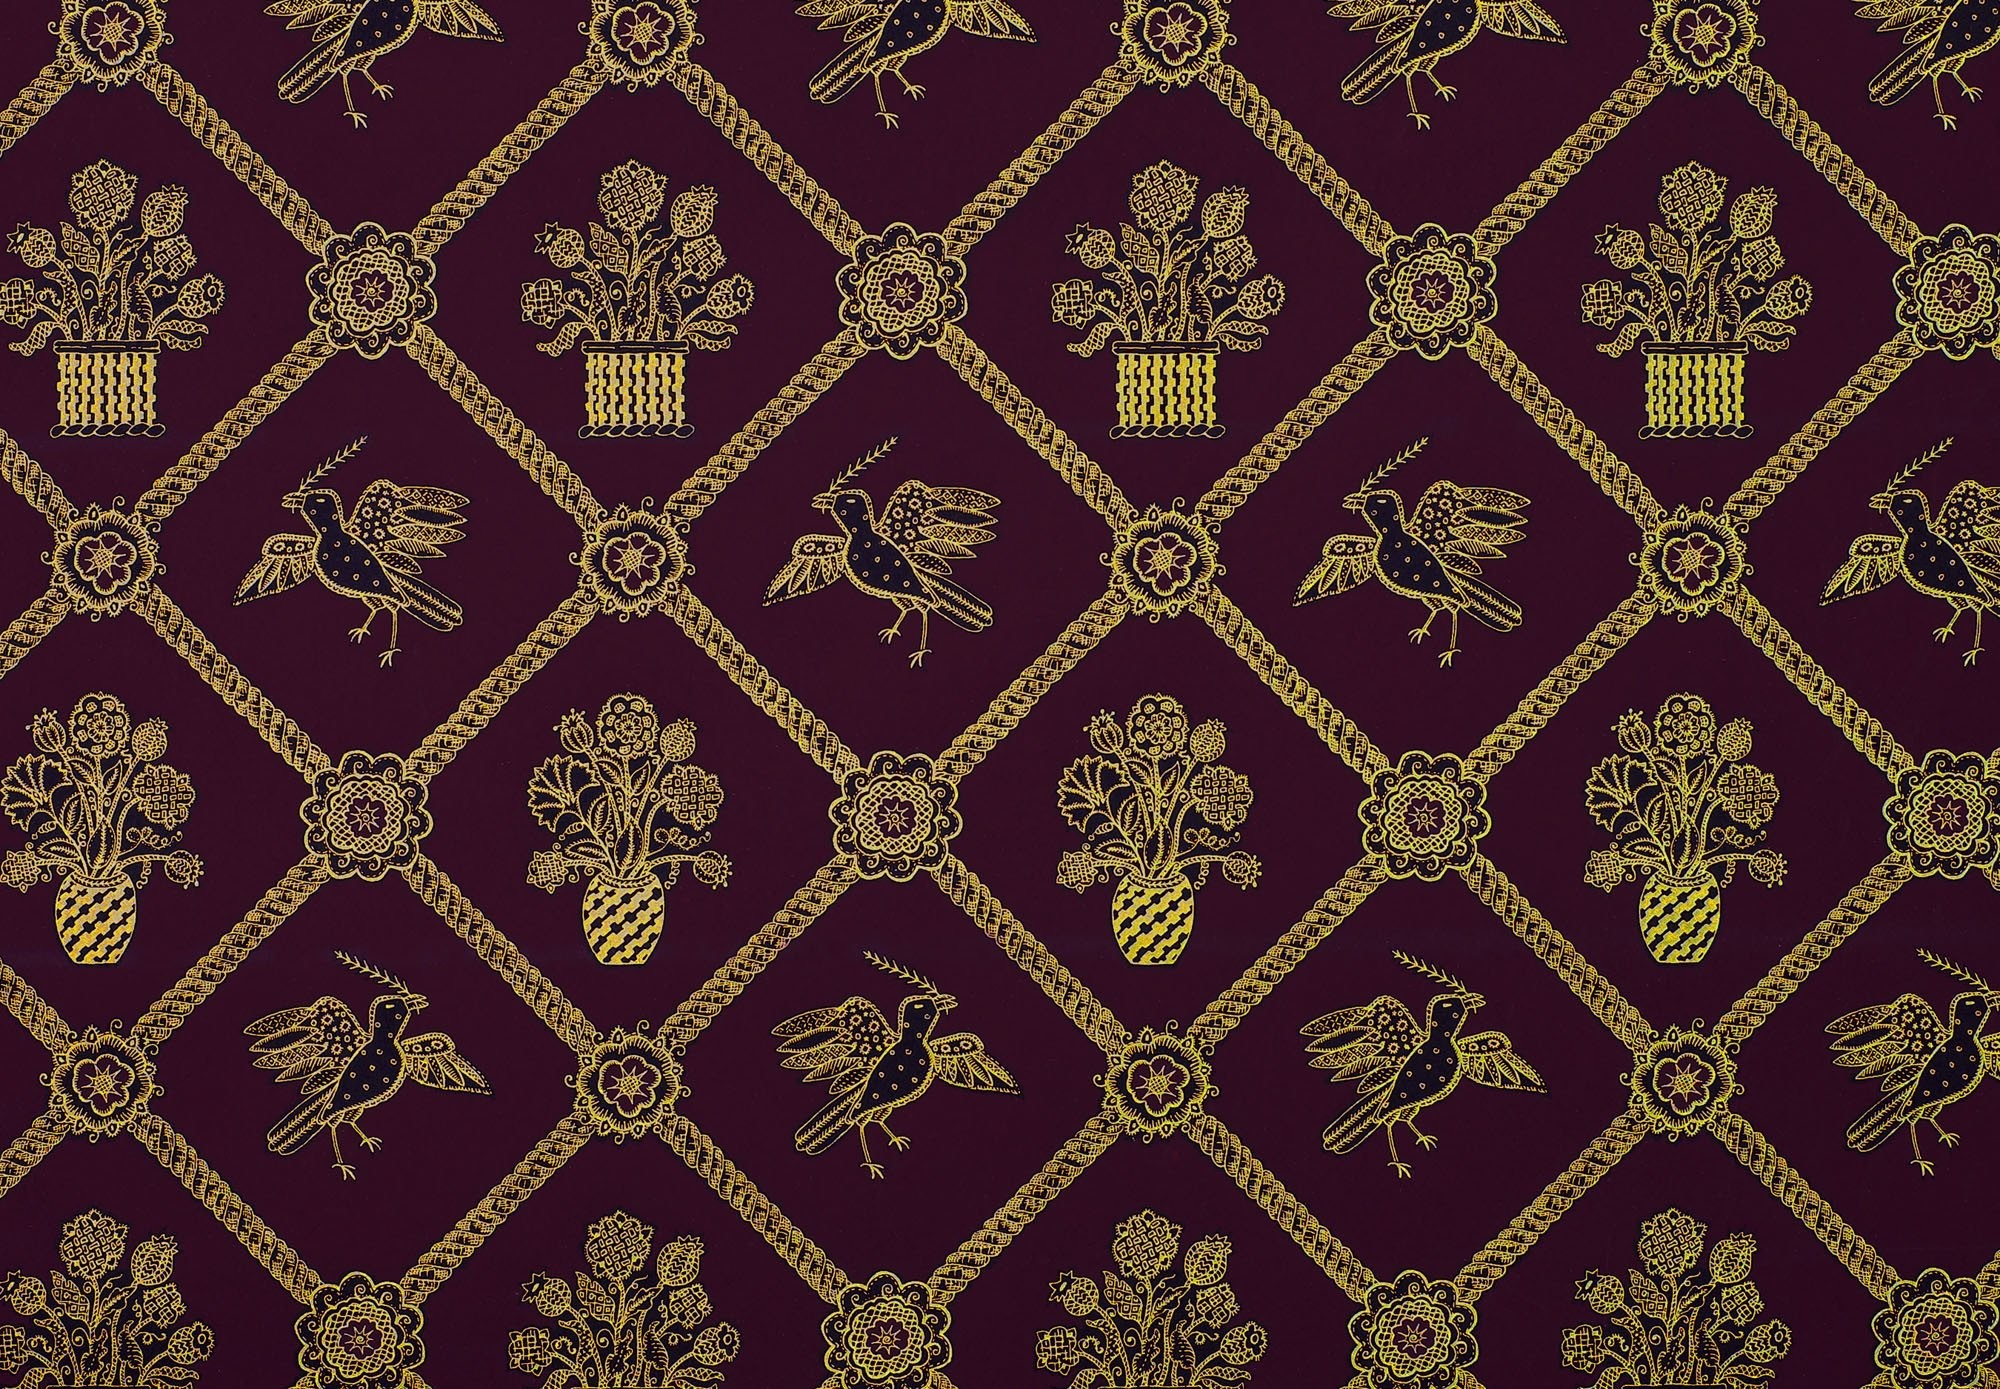 Rope Trellis Wallpaper – Purple / Black / Gold Metallic